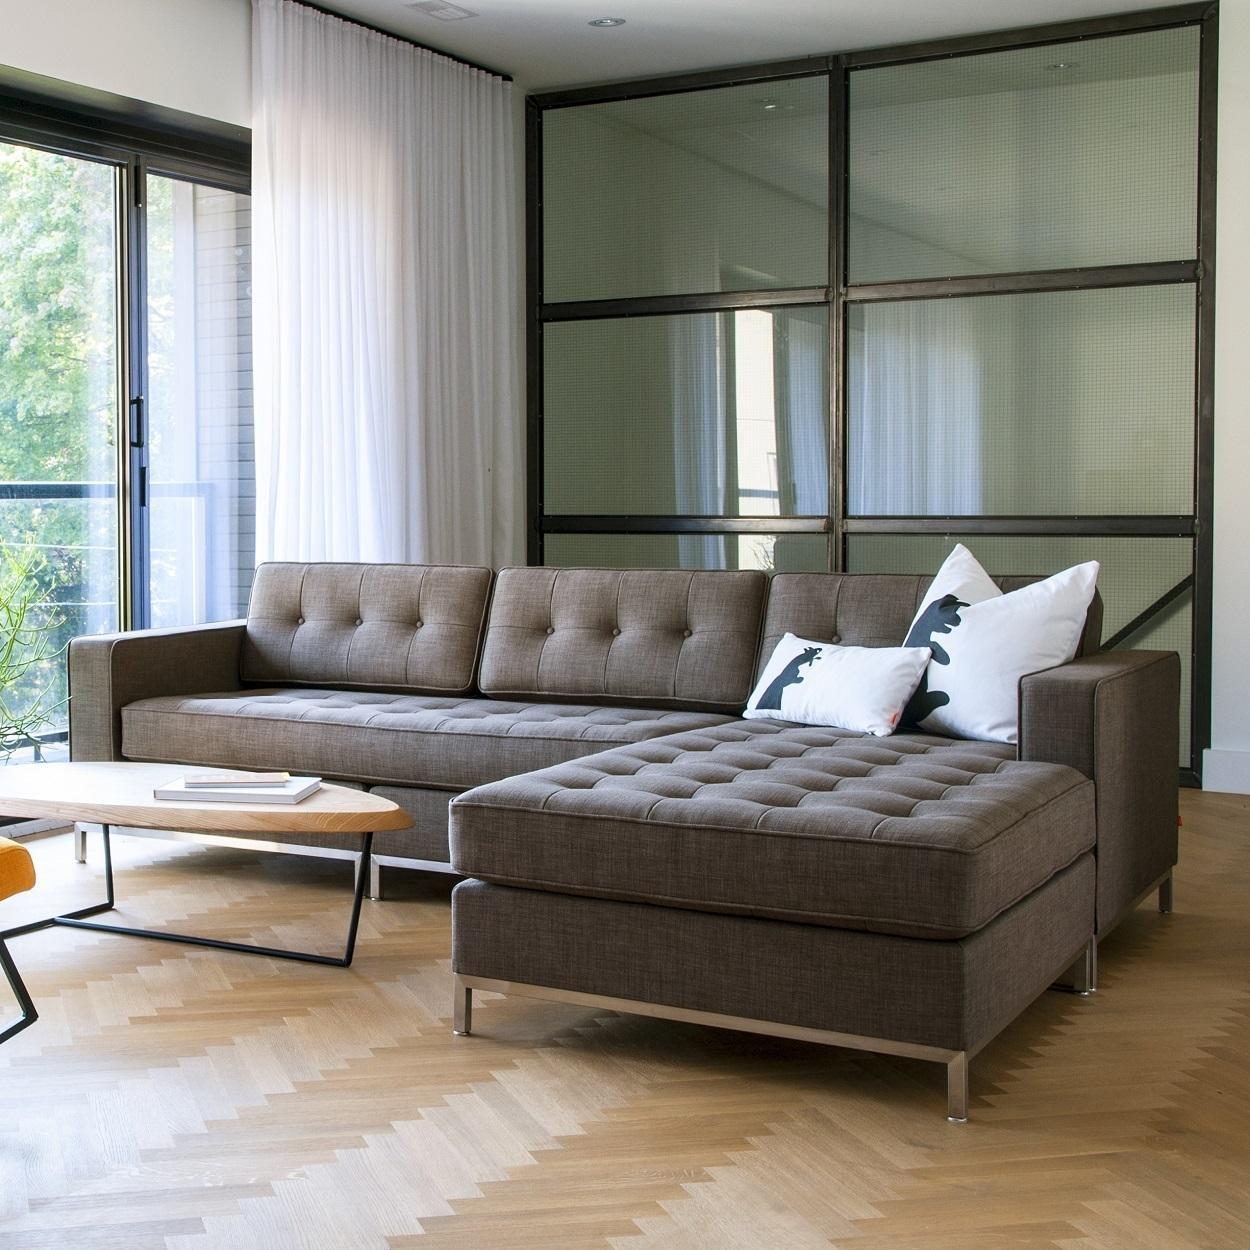 Gus Modern Furniture 2015 Summer Sale | Zin Home Blog Regarding Jane Bi Sectional Sofa (Image 3 of 20)